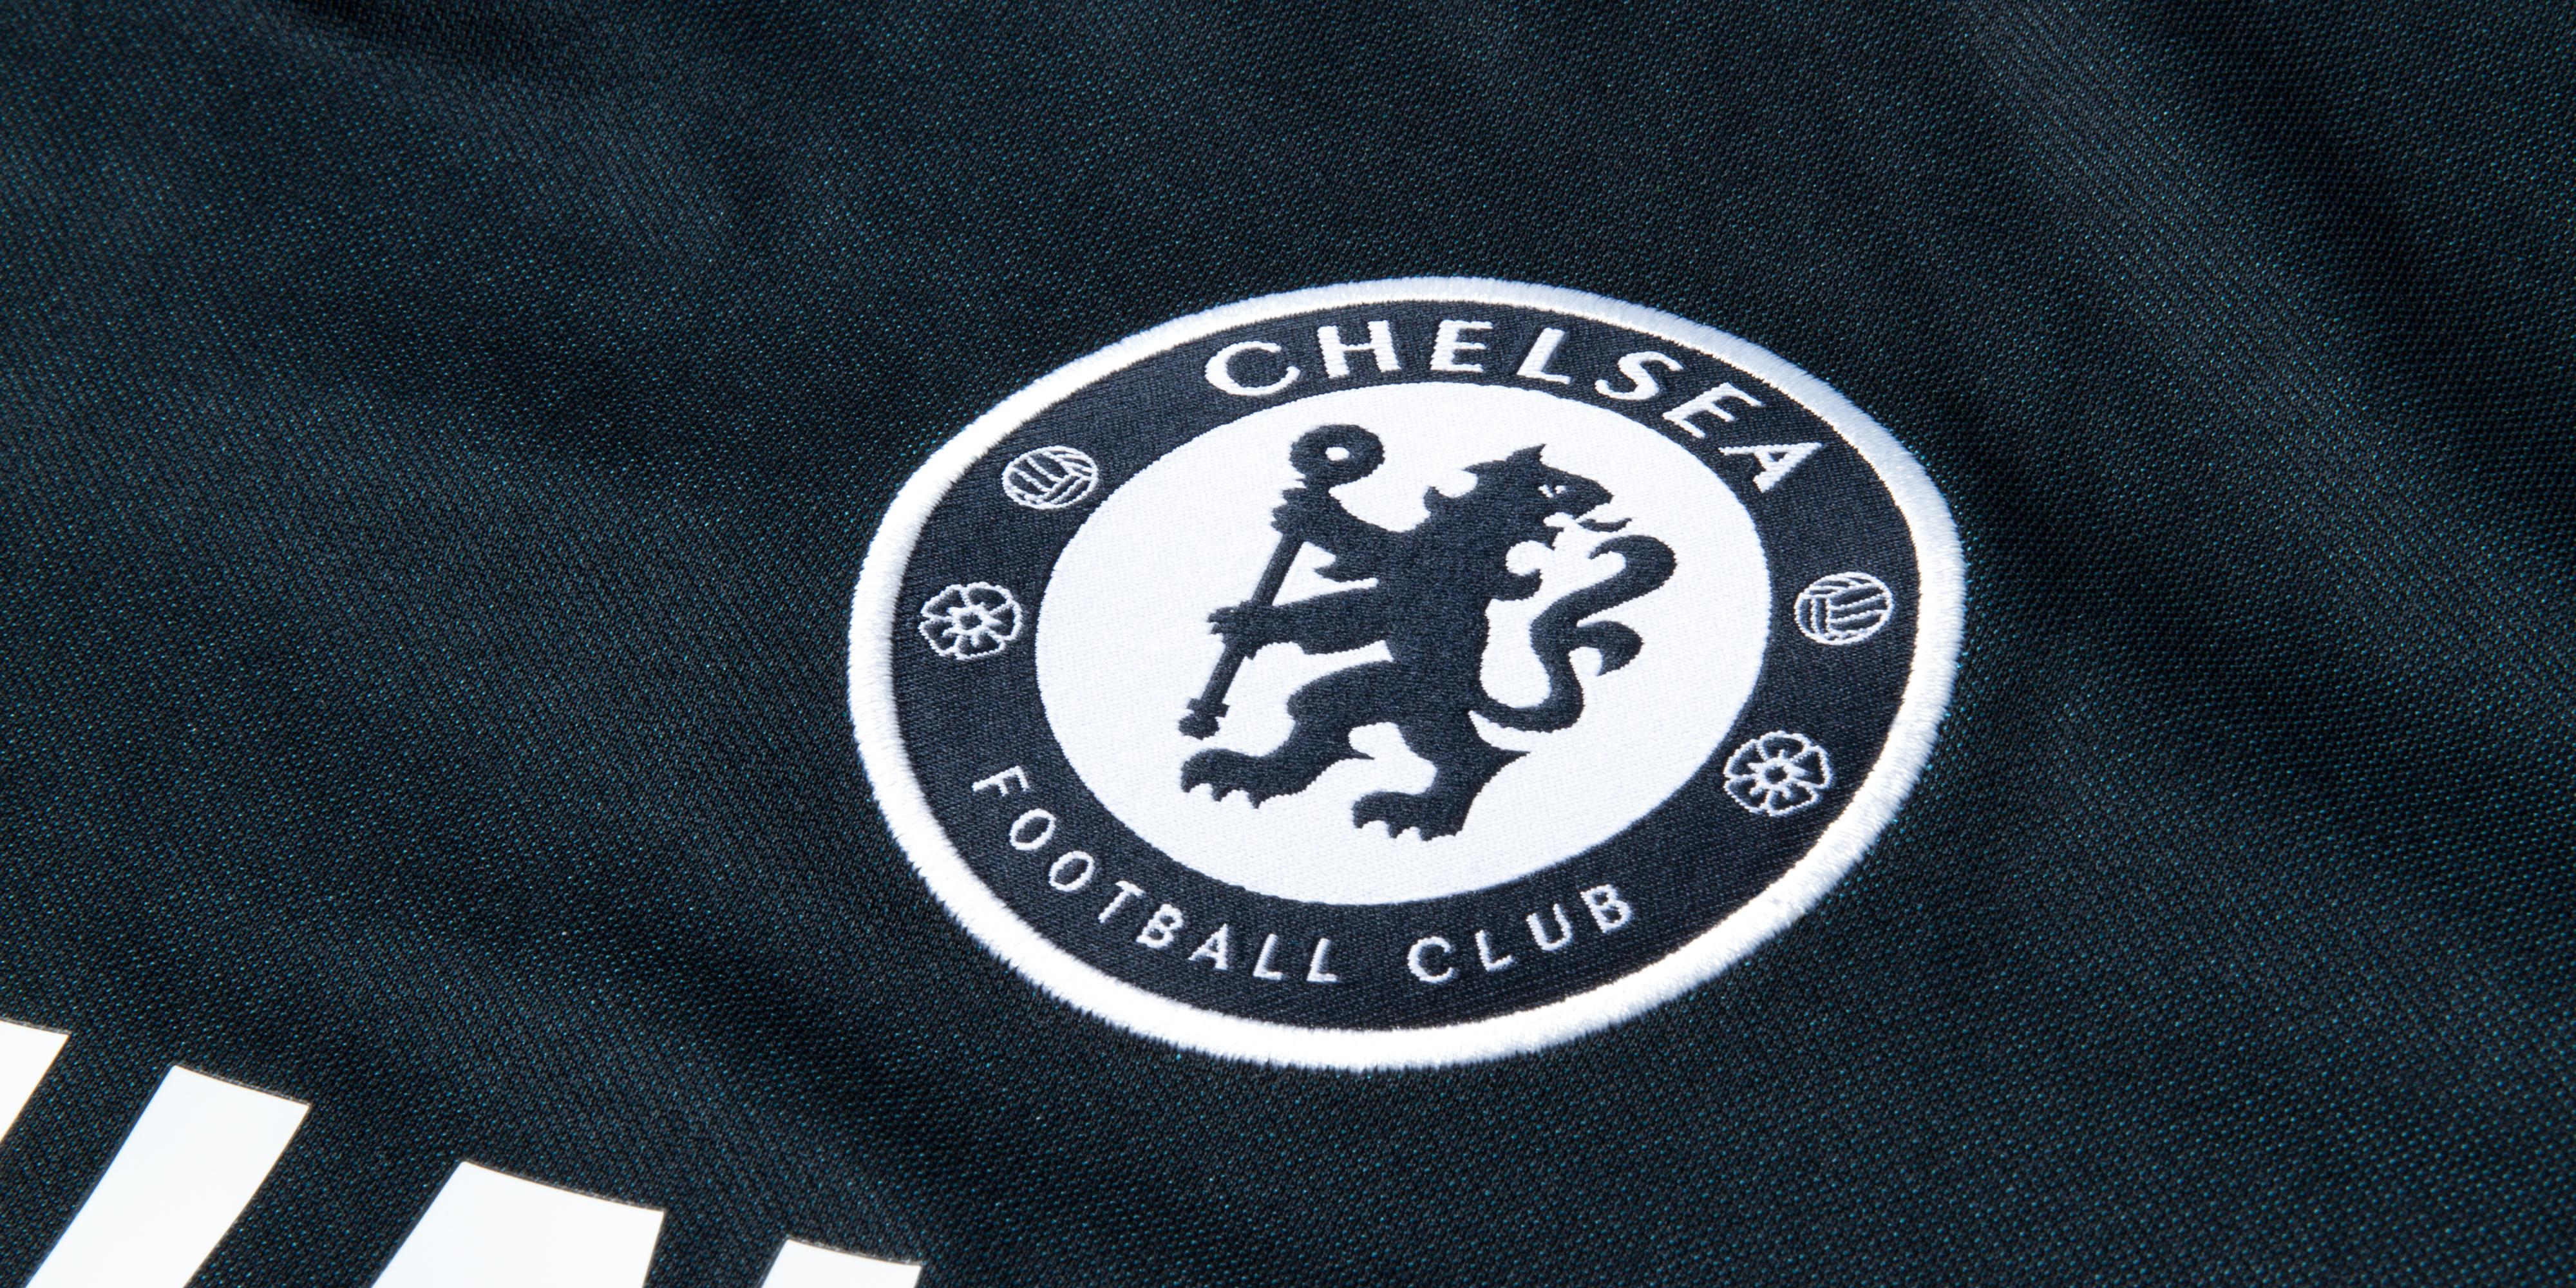 New Chelsea Kit The 12elfth Man